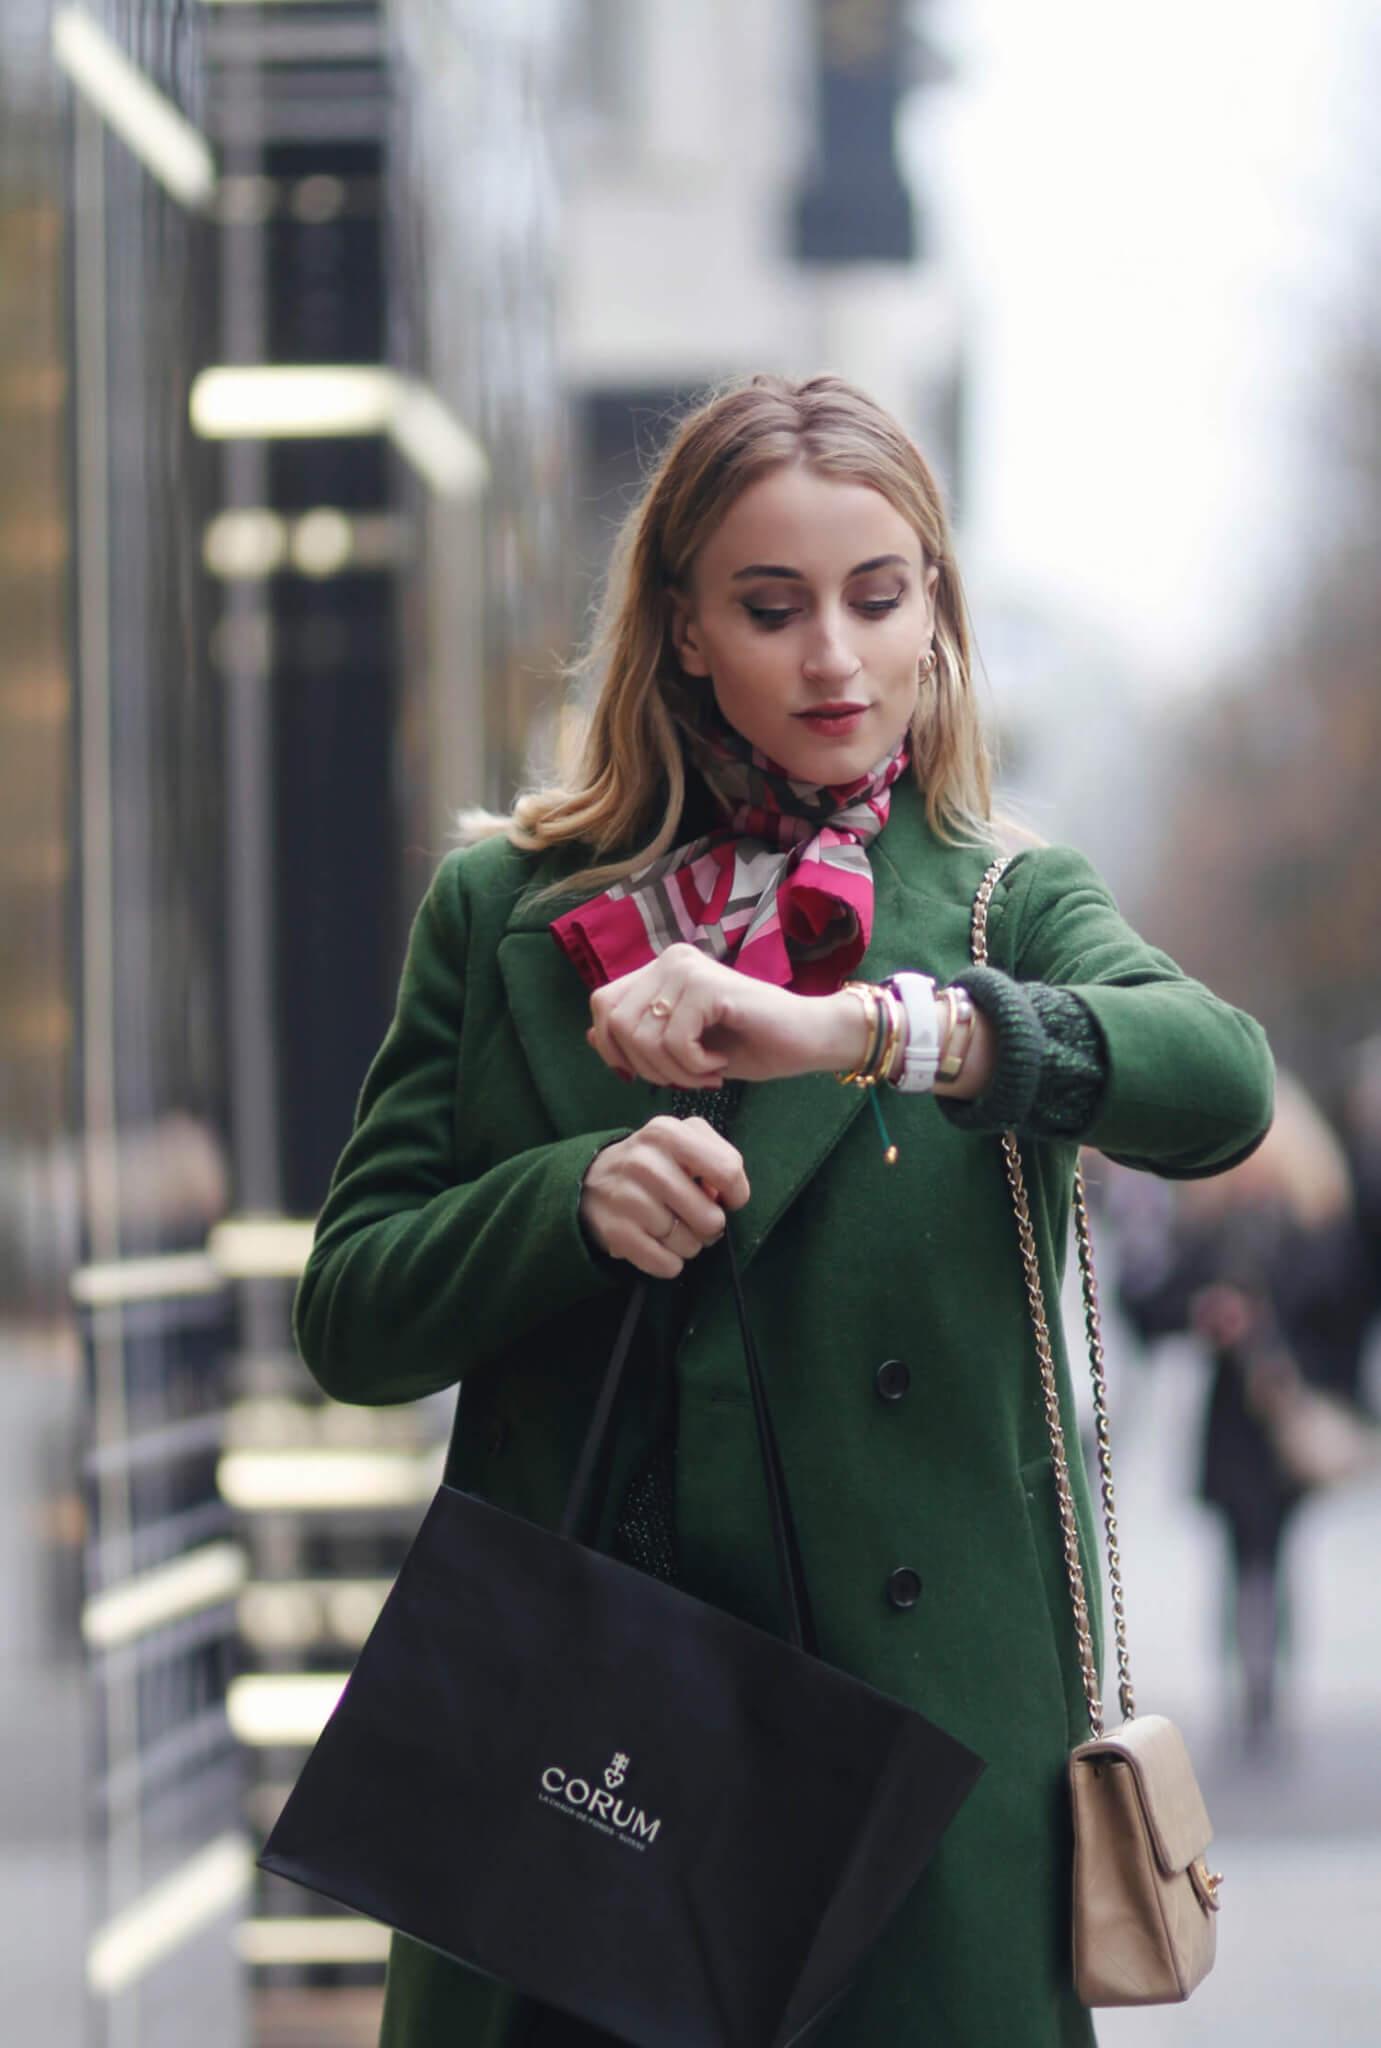 @queenofjet lags as a social media influencer for Corum